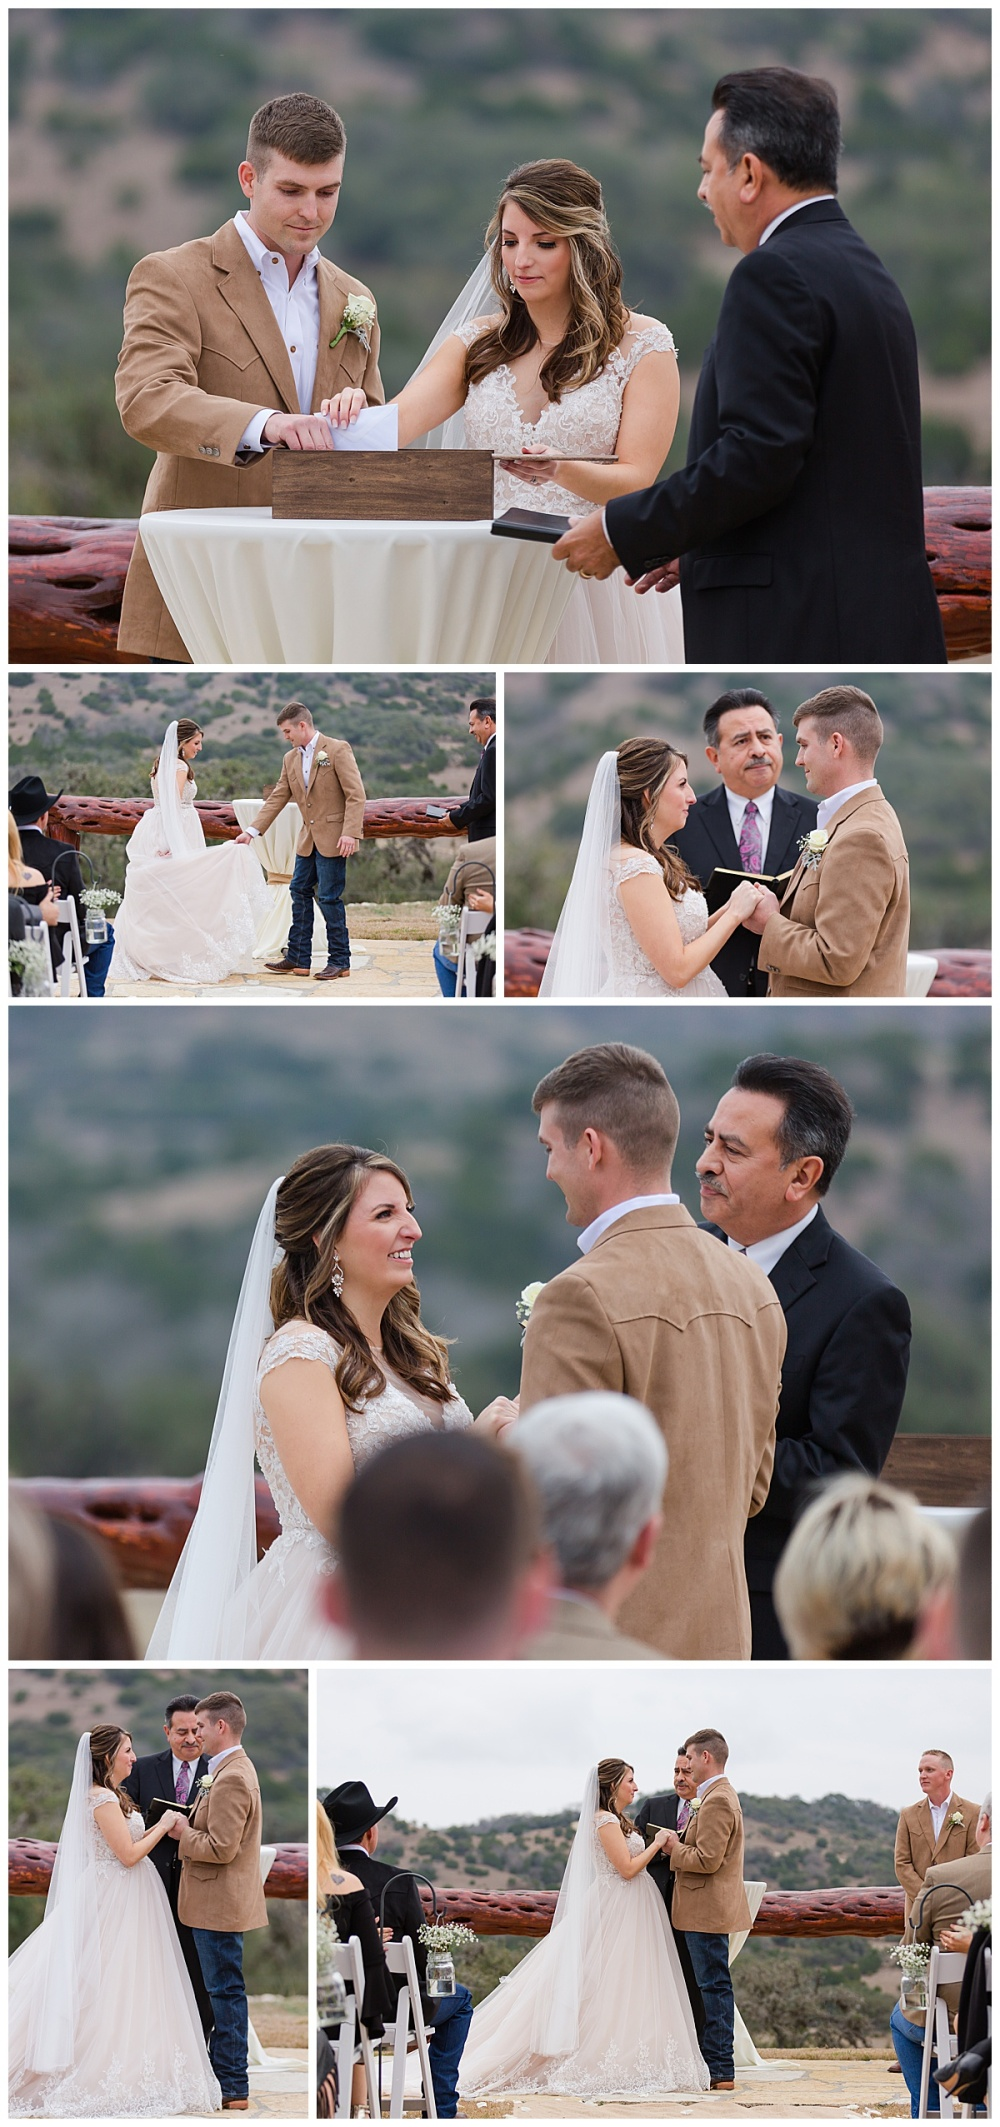 Wedding-Photographer-Texas-Hill-Country-Happy-H-Ranch-Comfor-Texas-Carly-Barton-Photography_0025.jpg